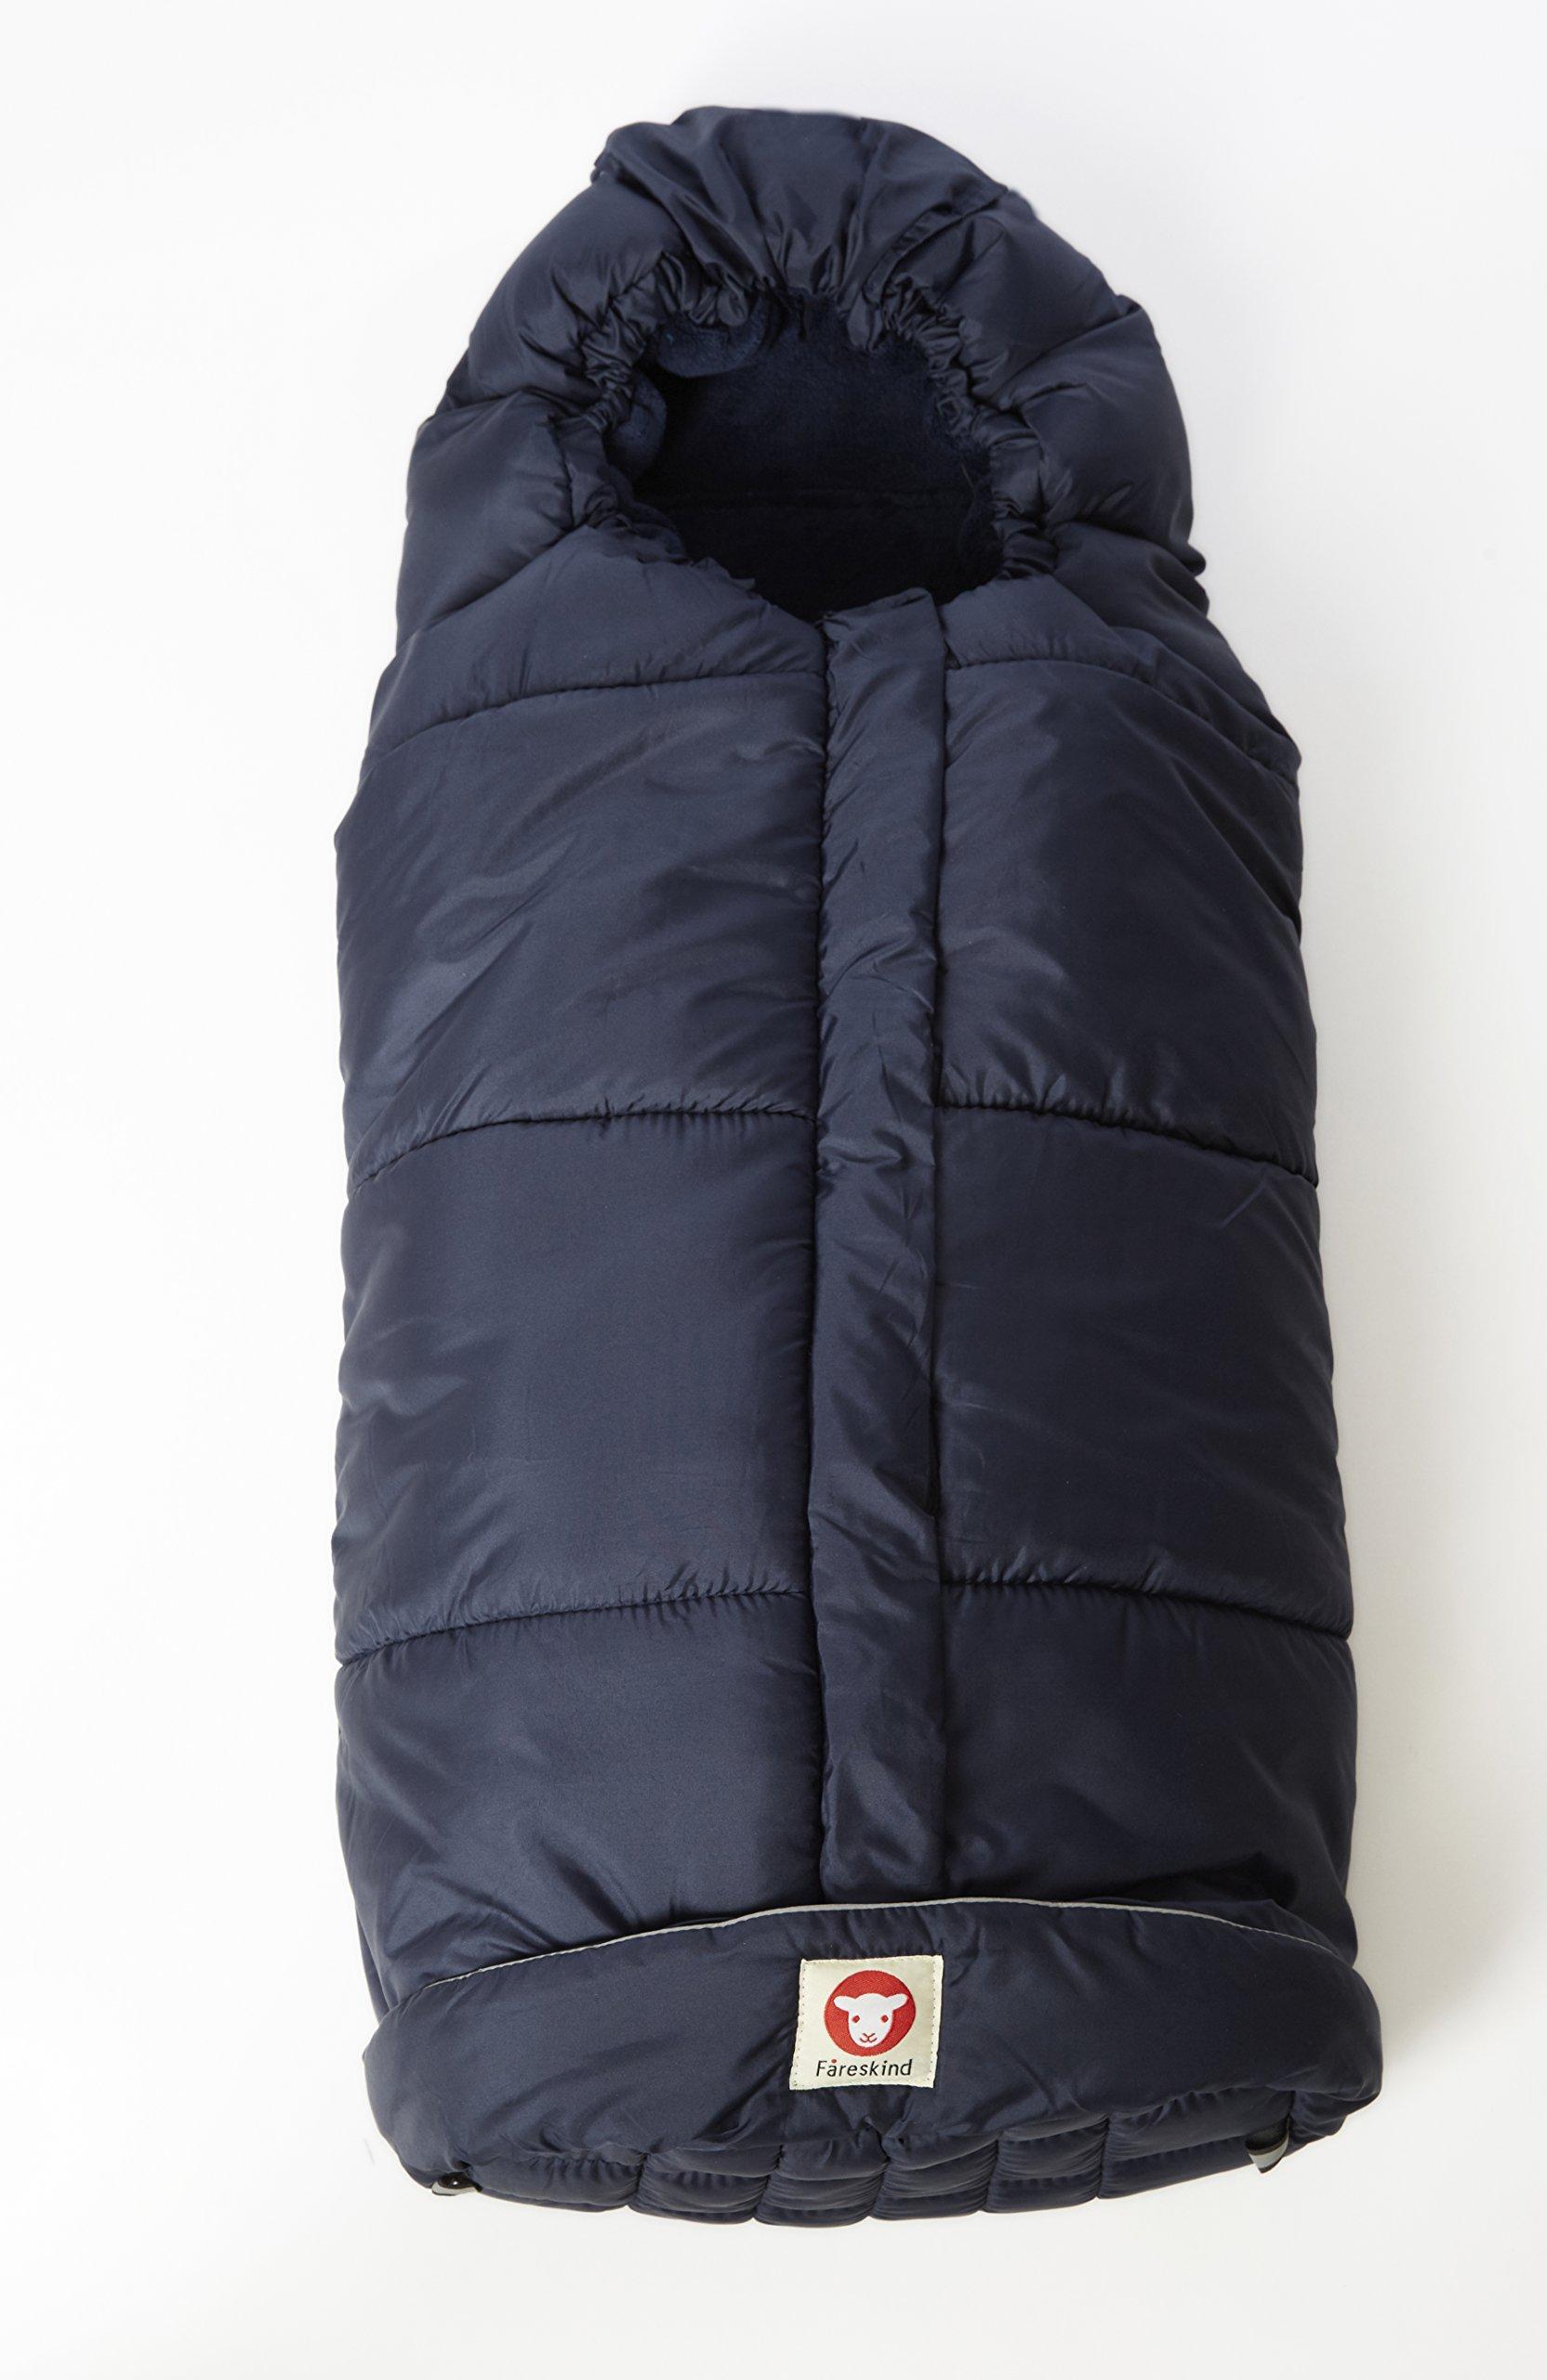 Fareskind Comfy Cruiser Bunting Bag, Blue, 0-4 Years